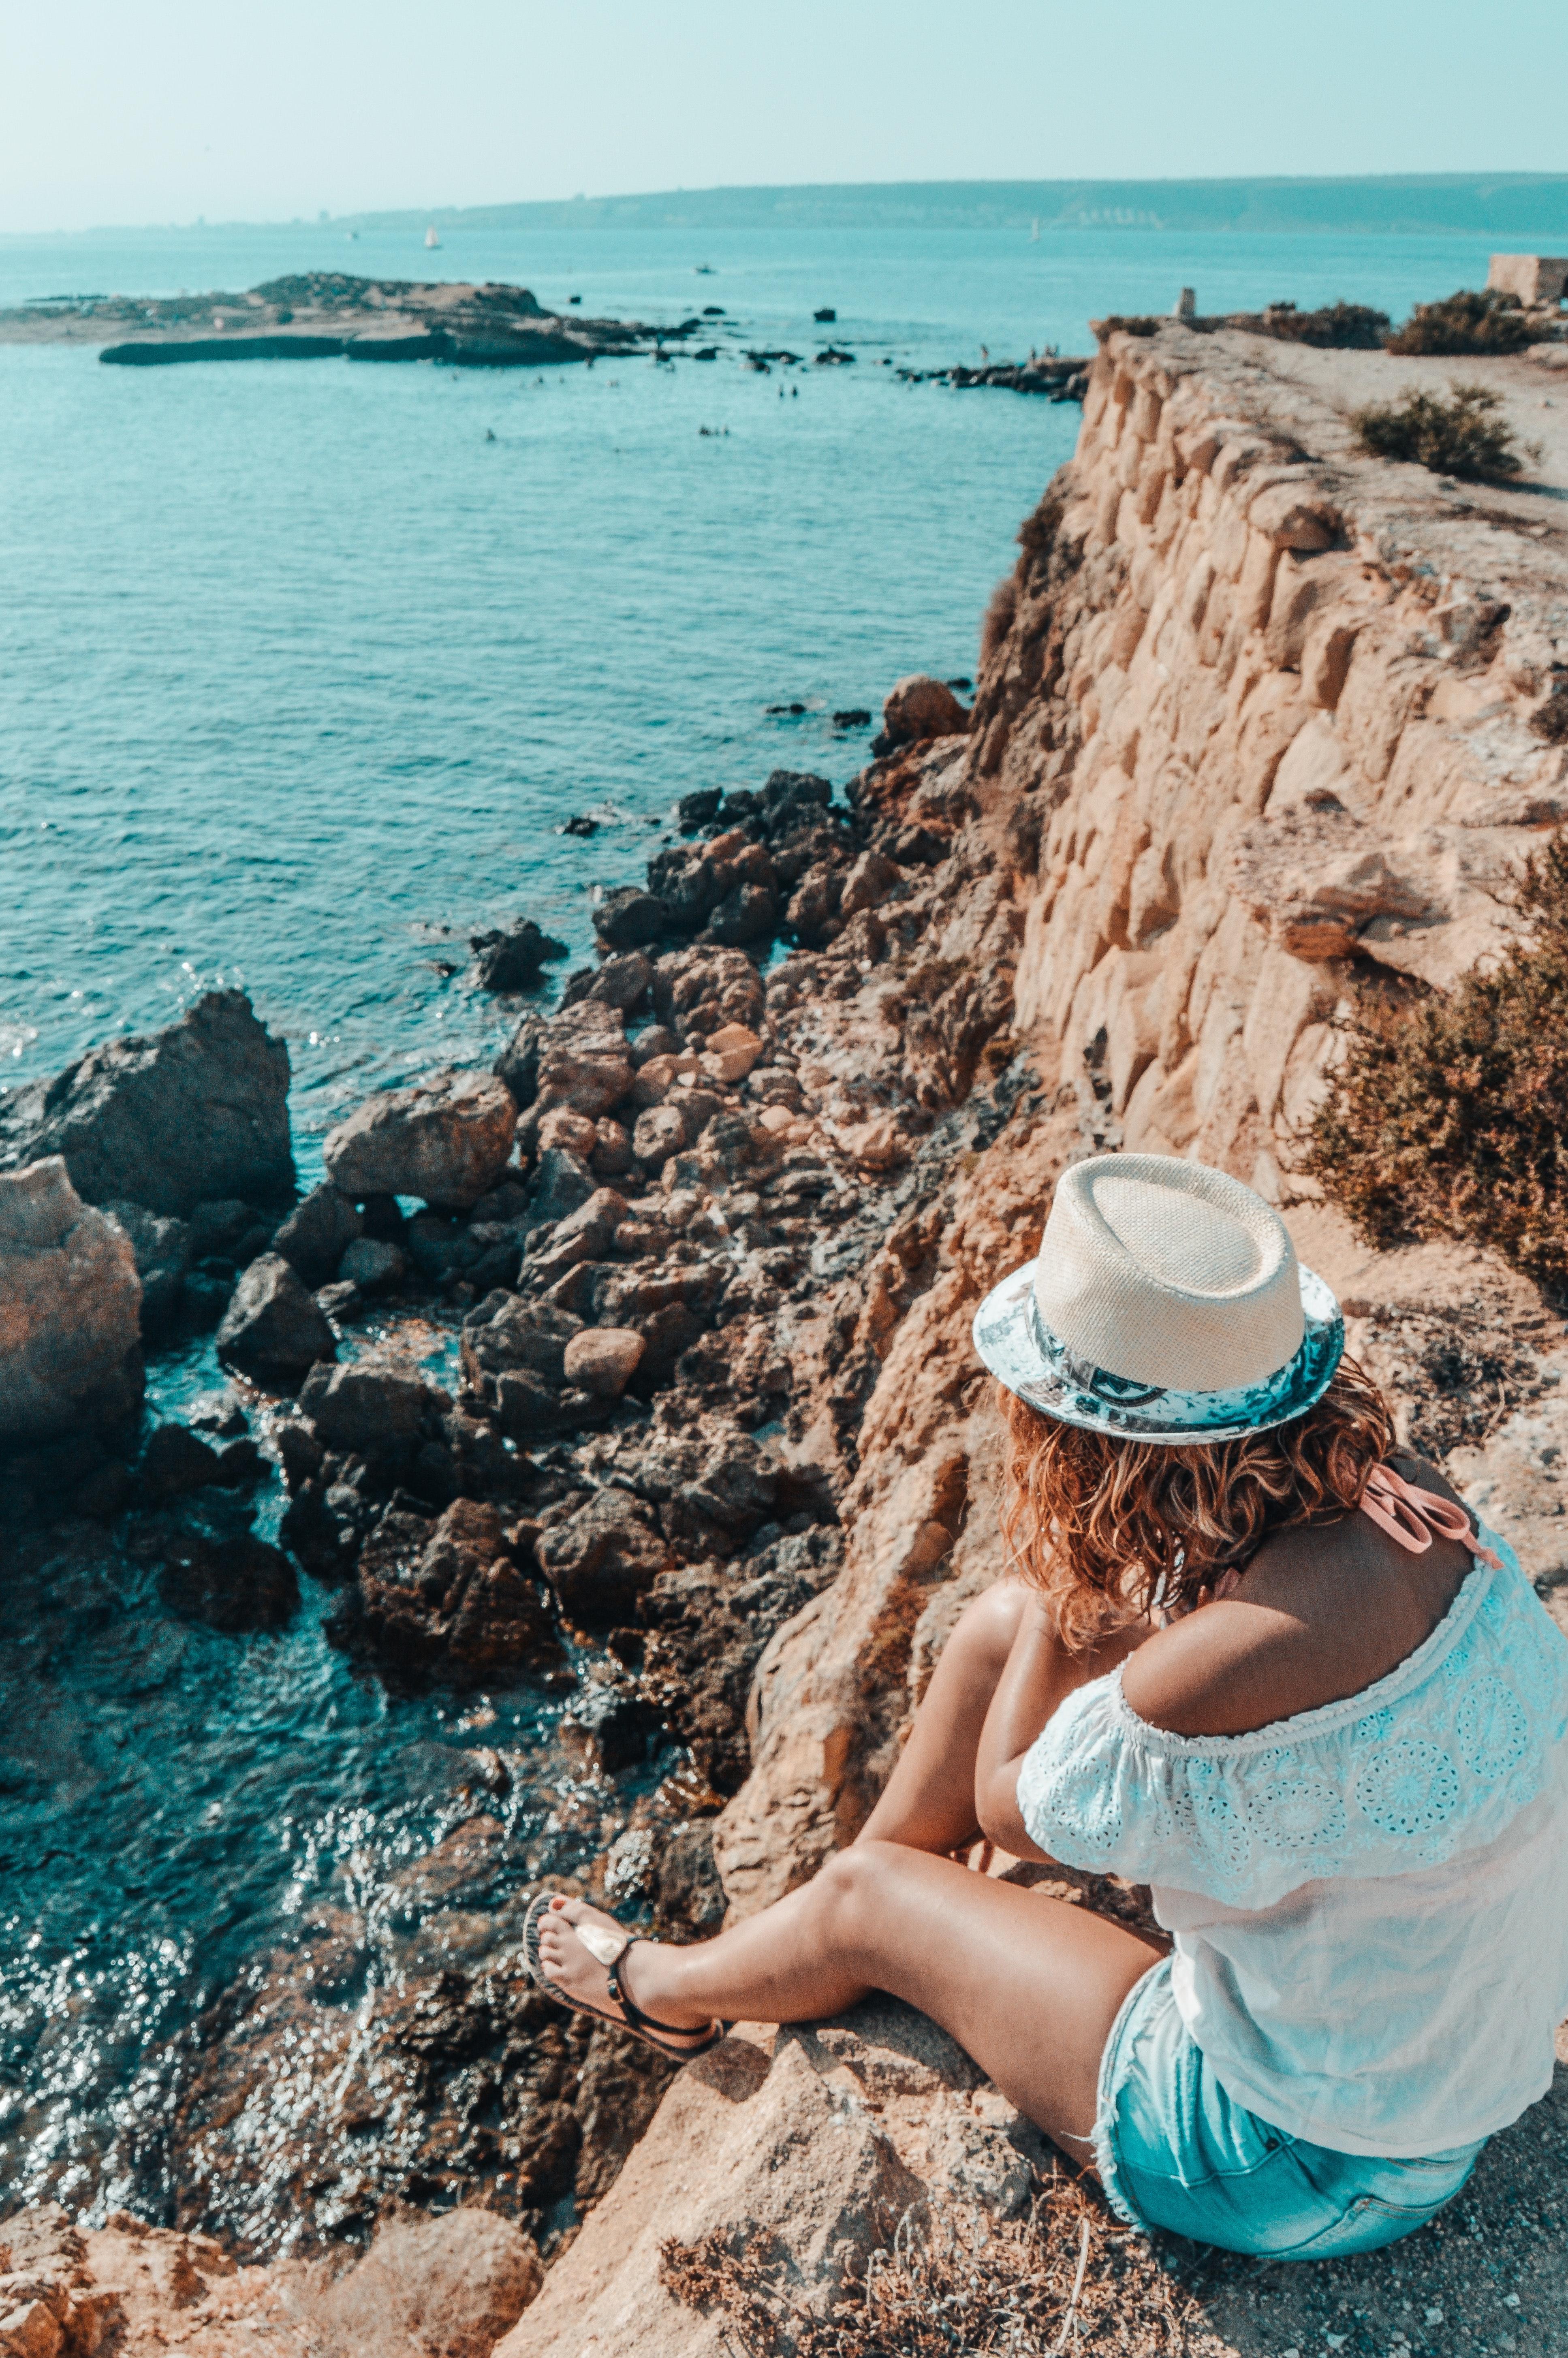 Woman Sitting in Stone Near Body of Water, Beach, Rocks, Waves, Water, HQ Photo